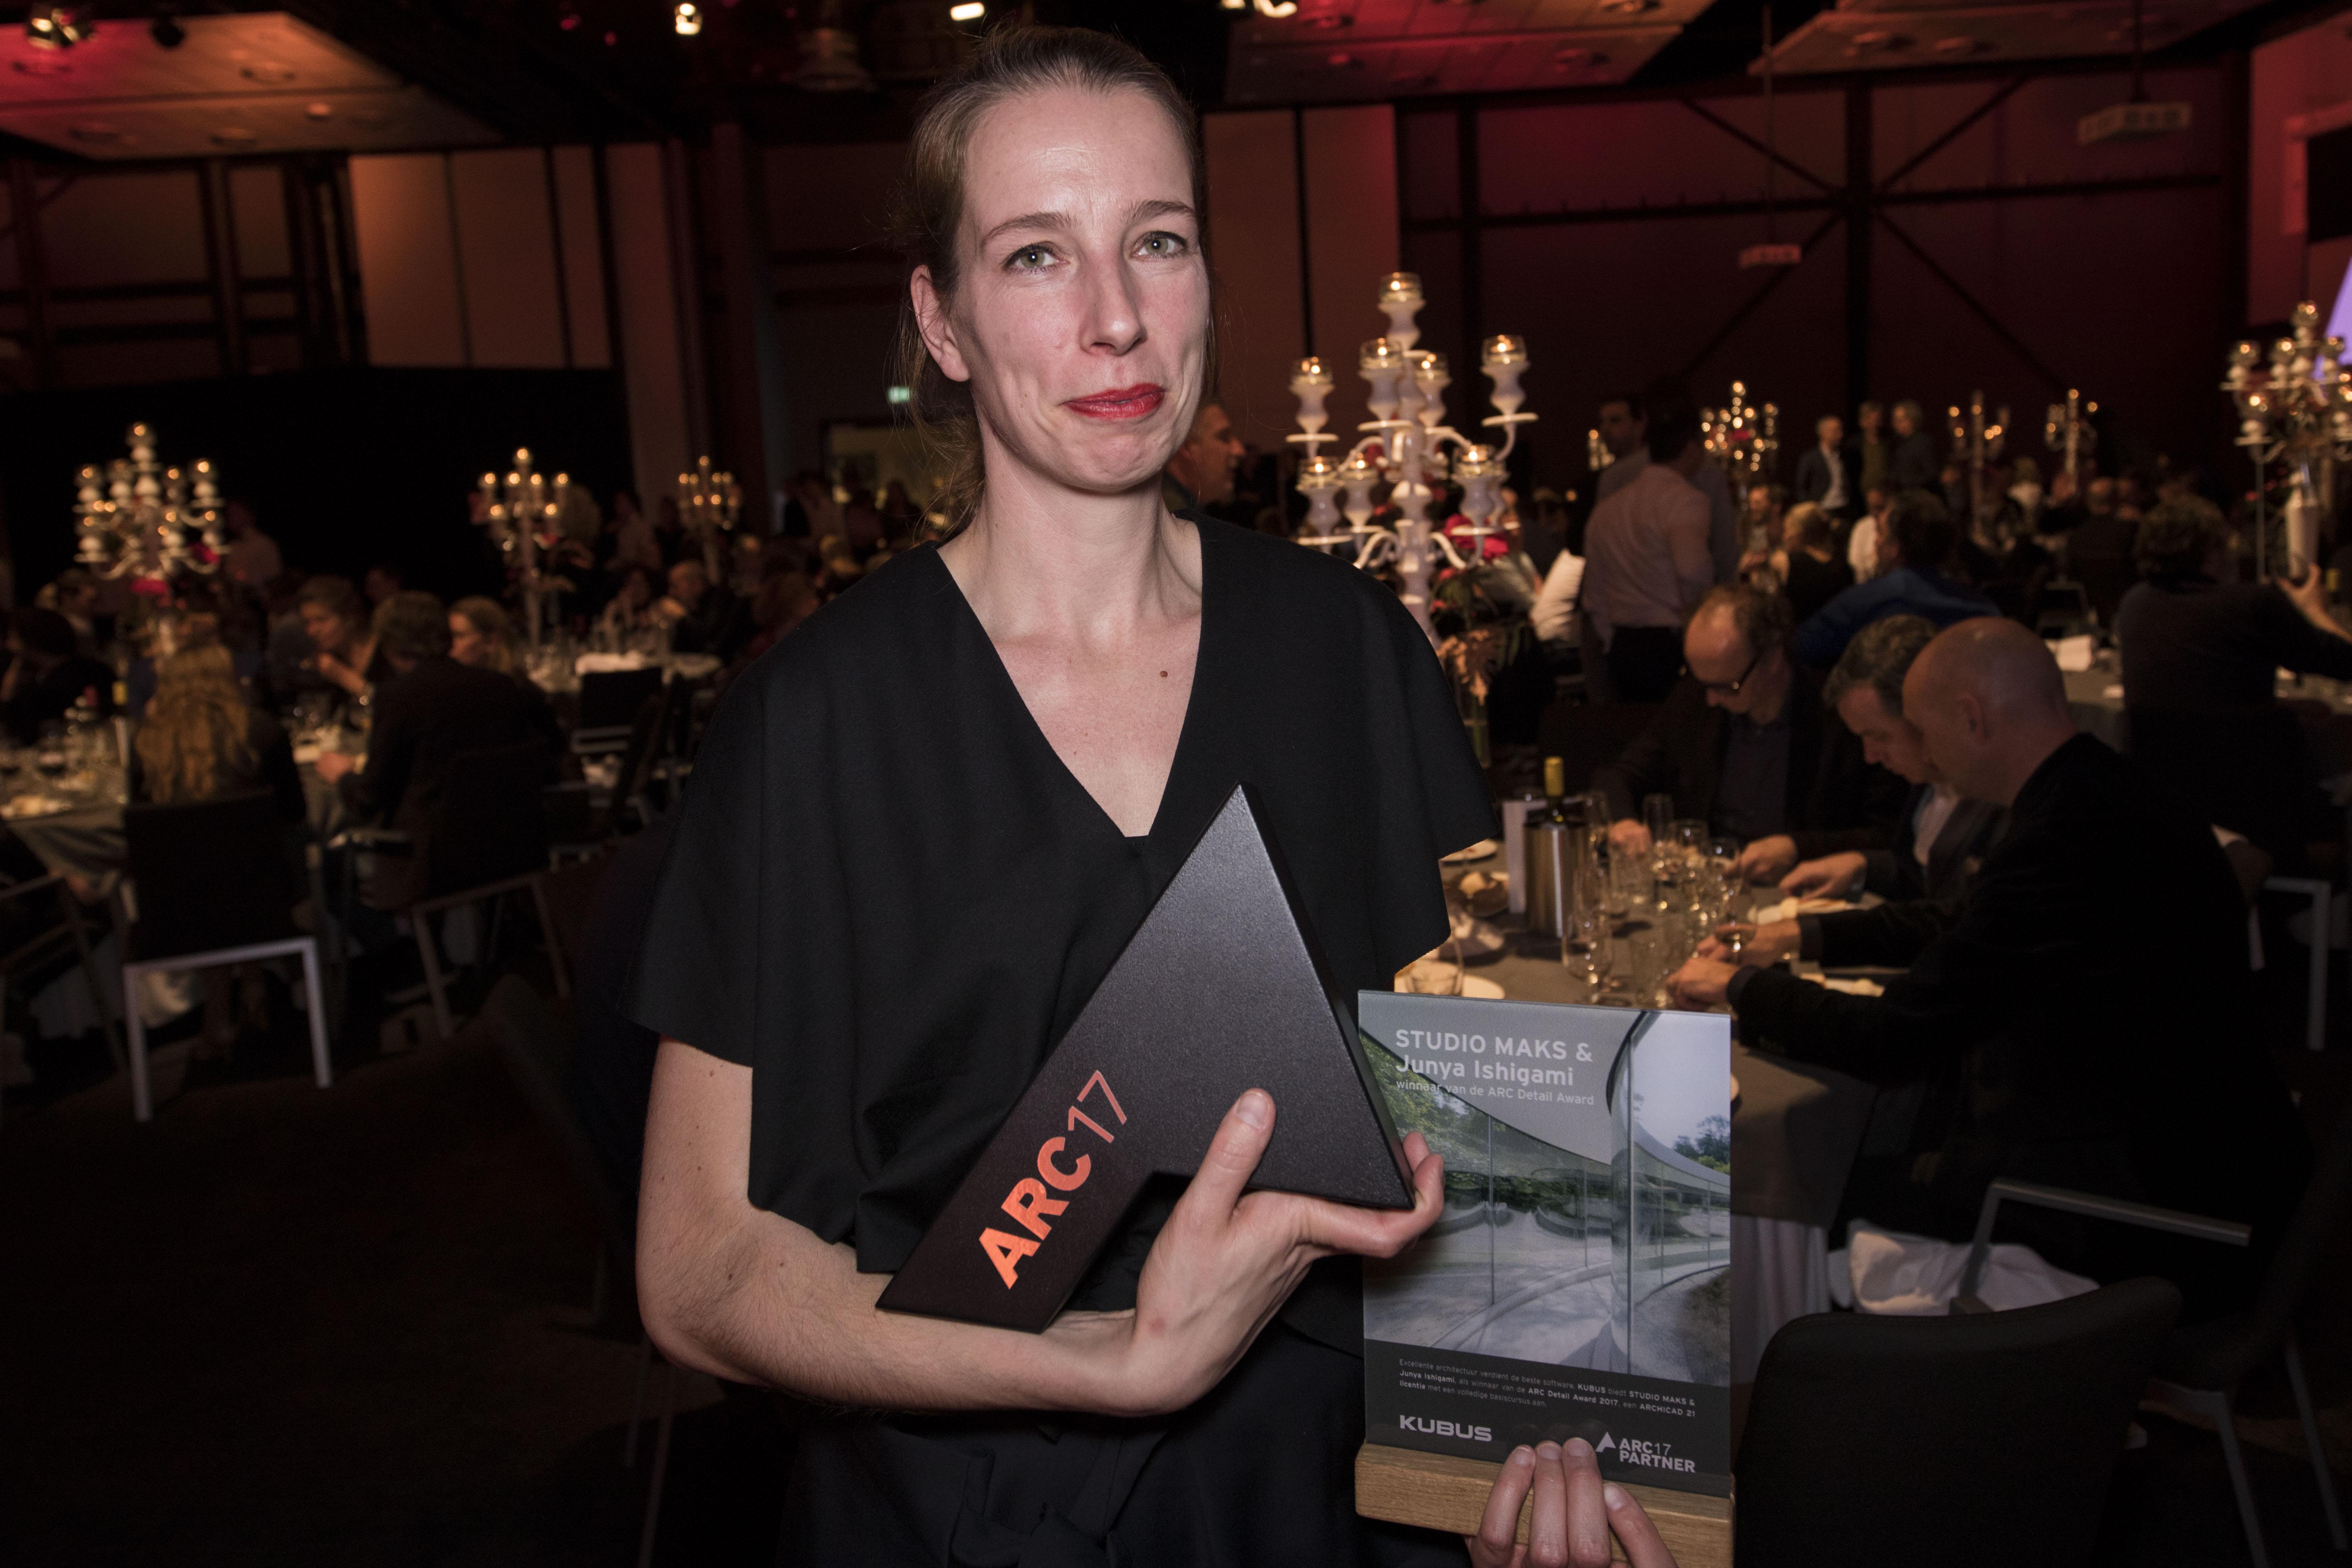 <p>Marieke Kums van STUDIO MAKS neemt de ARC17 Detail Award in ontvangst. Foto: Elvins Fotografie</p>